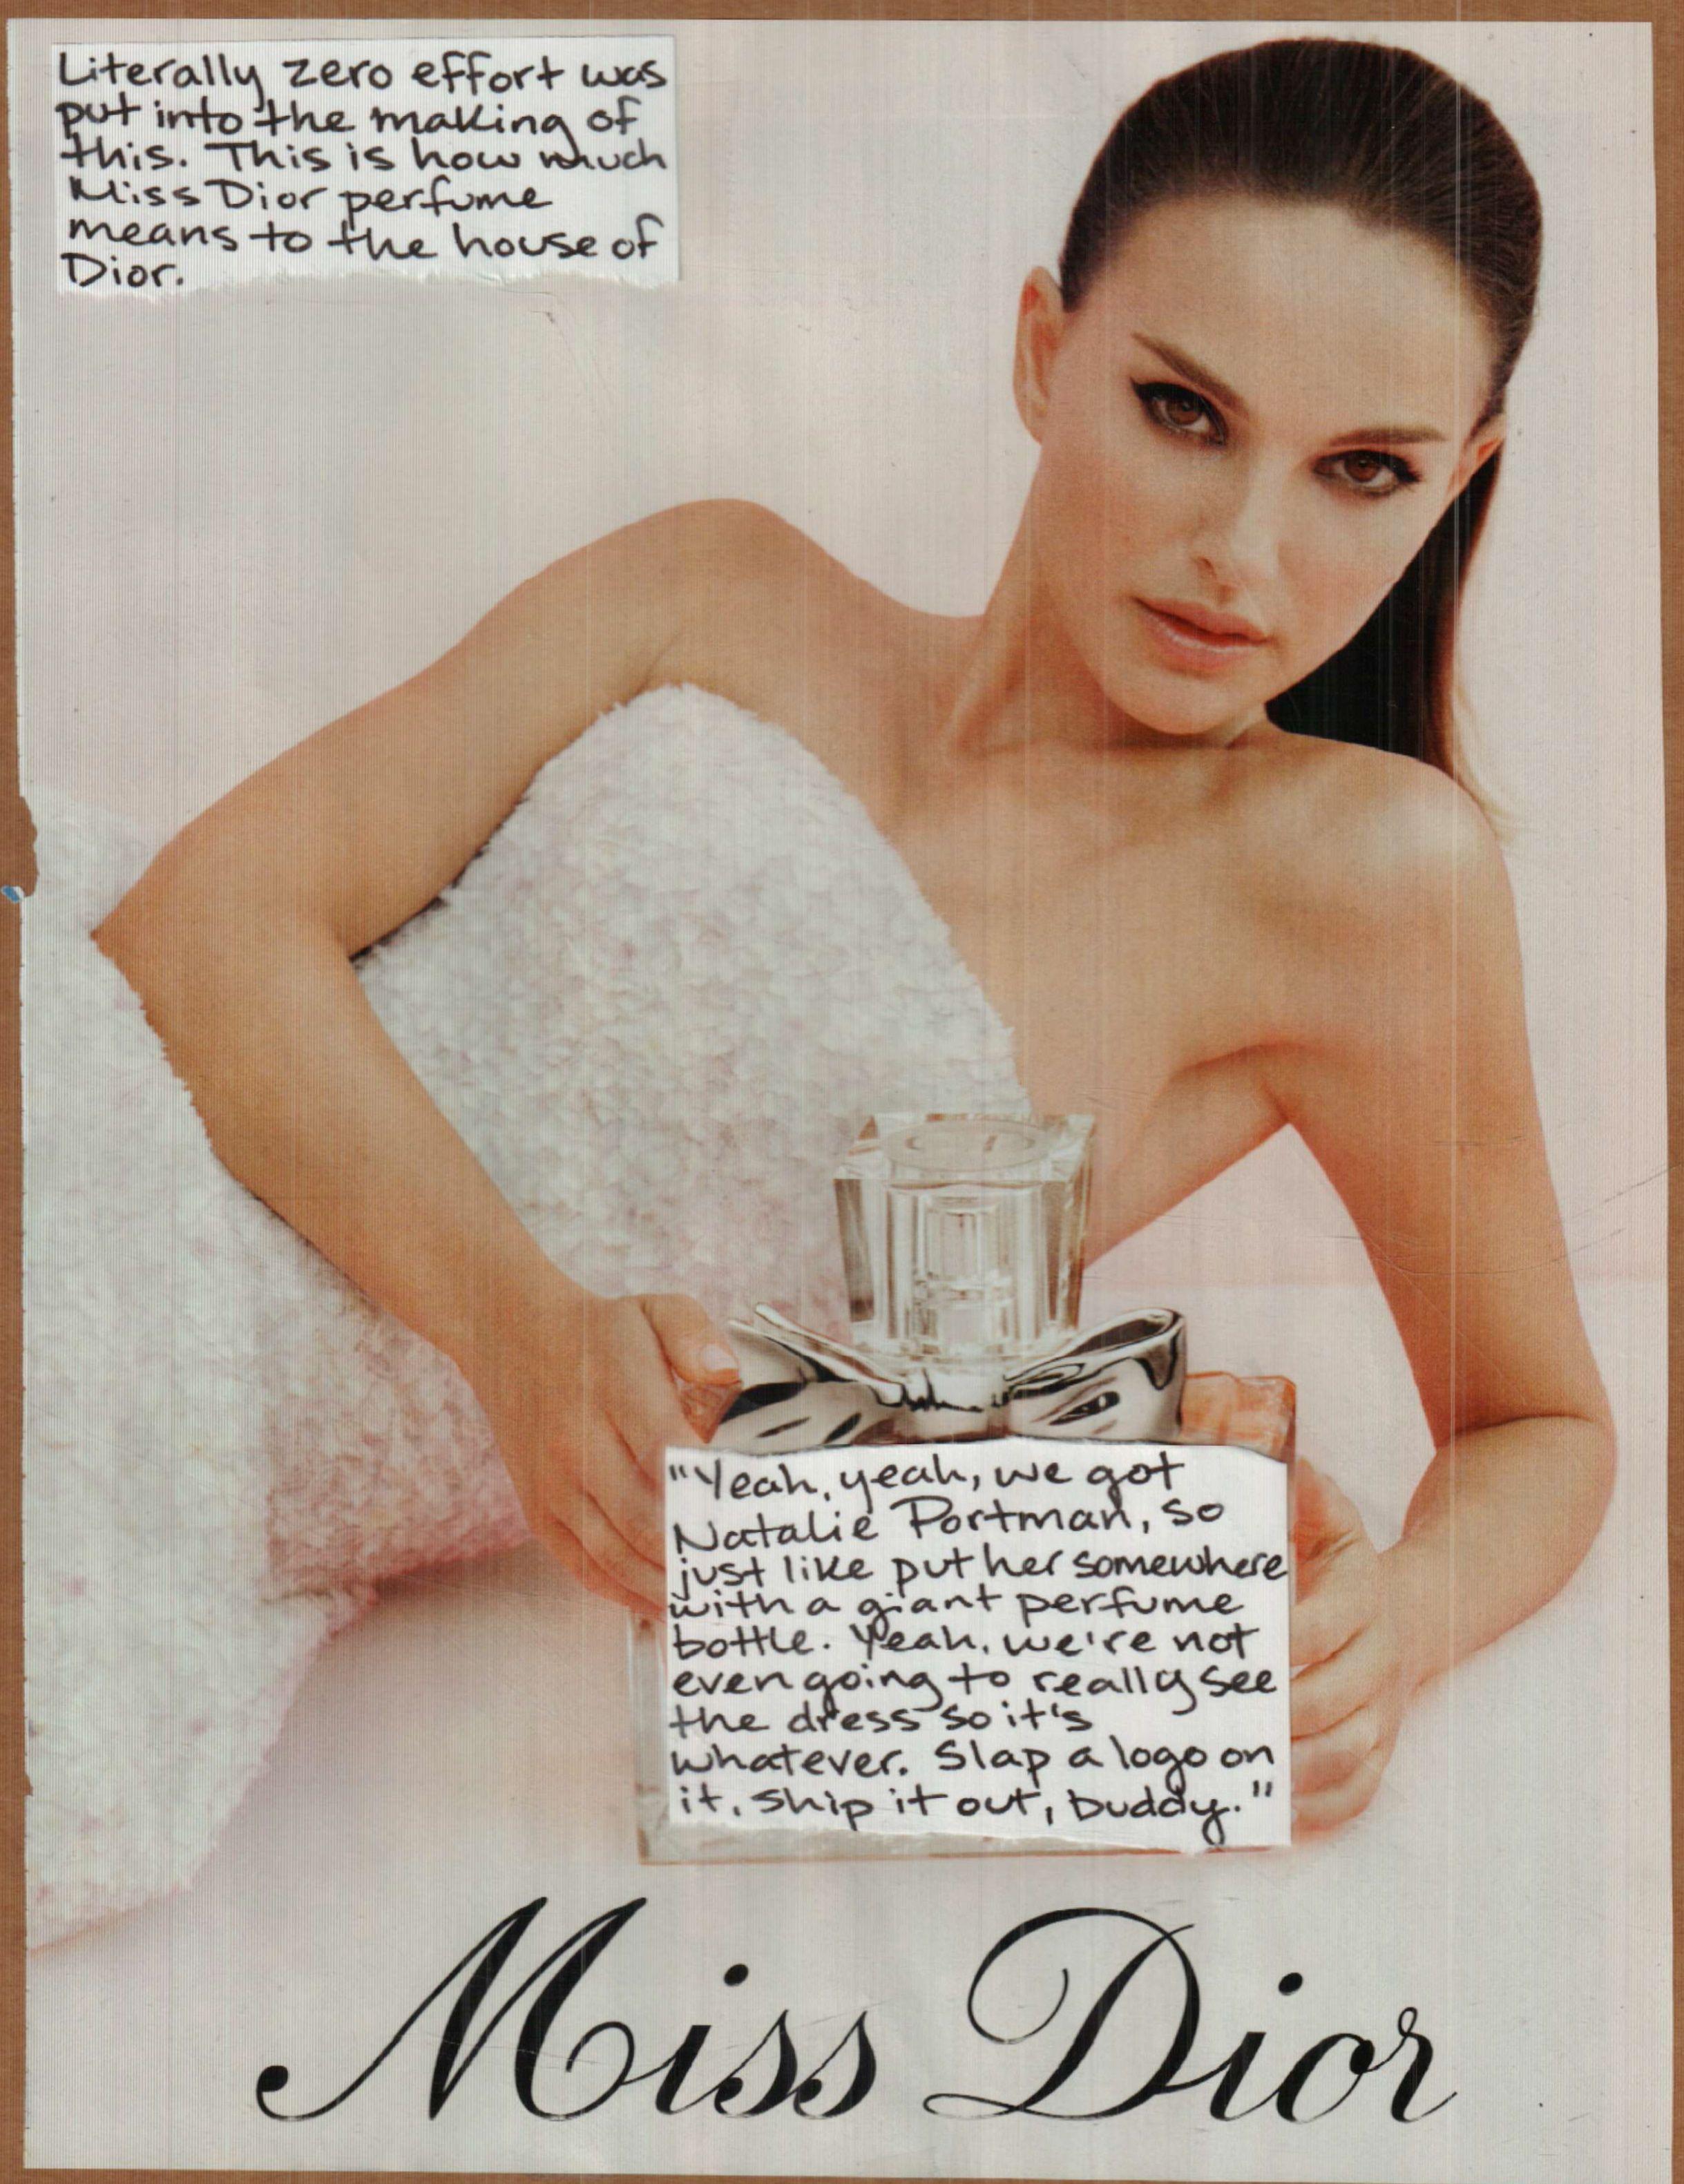 RV Mar 13 Miss Dior